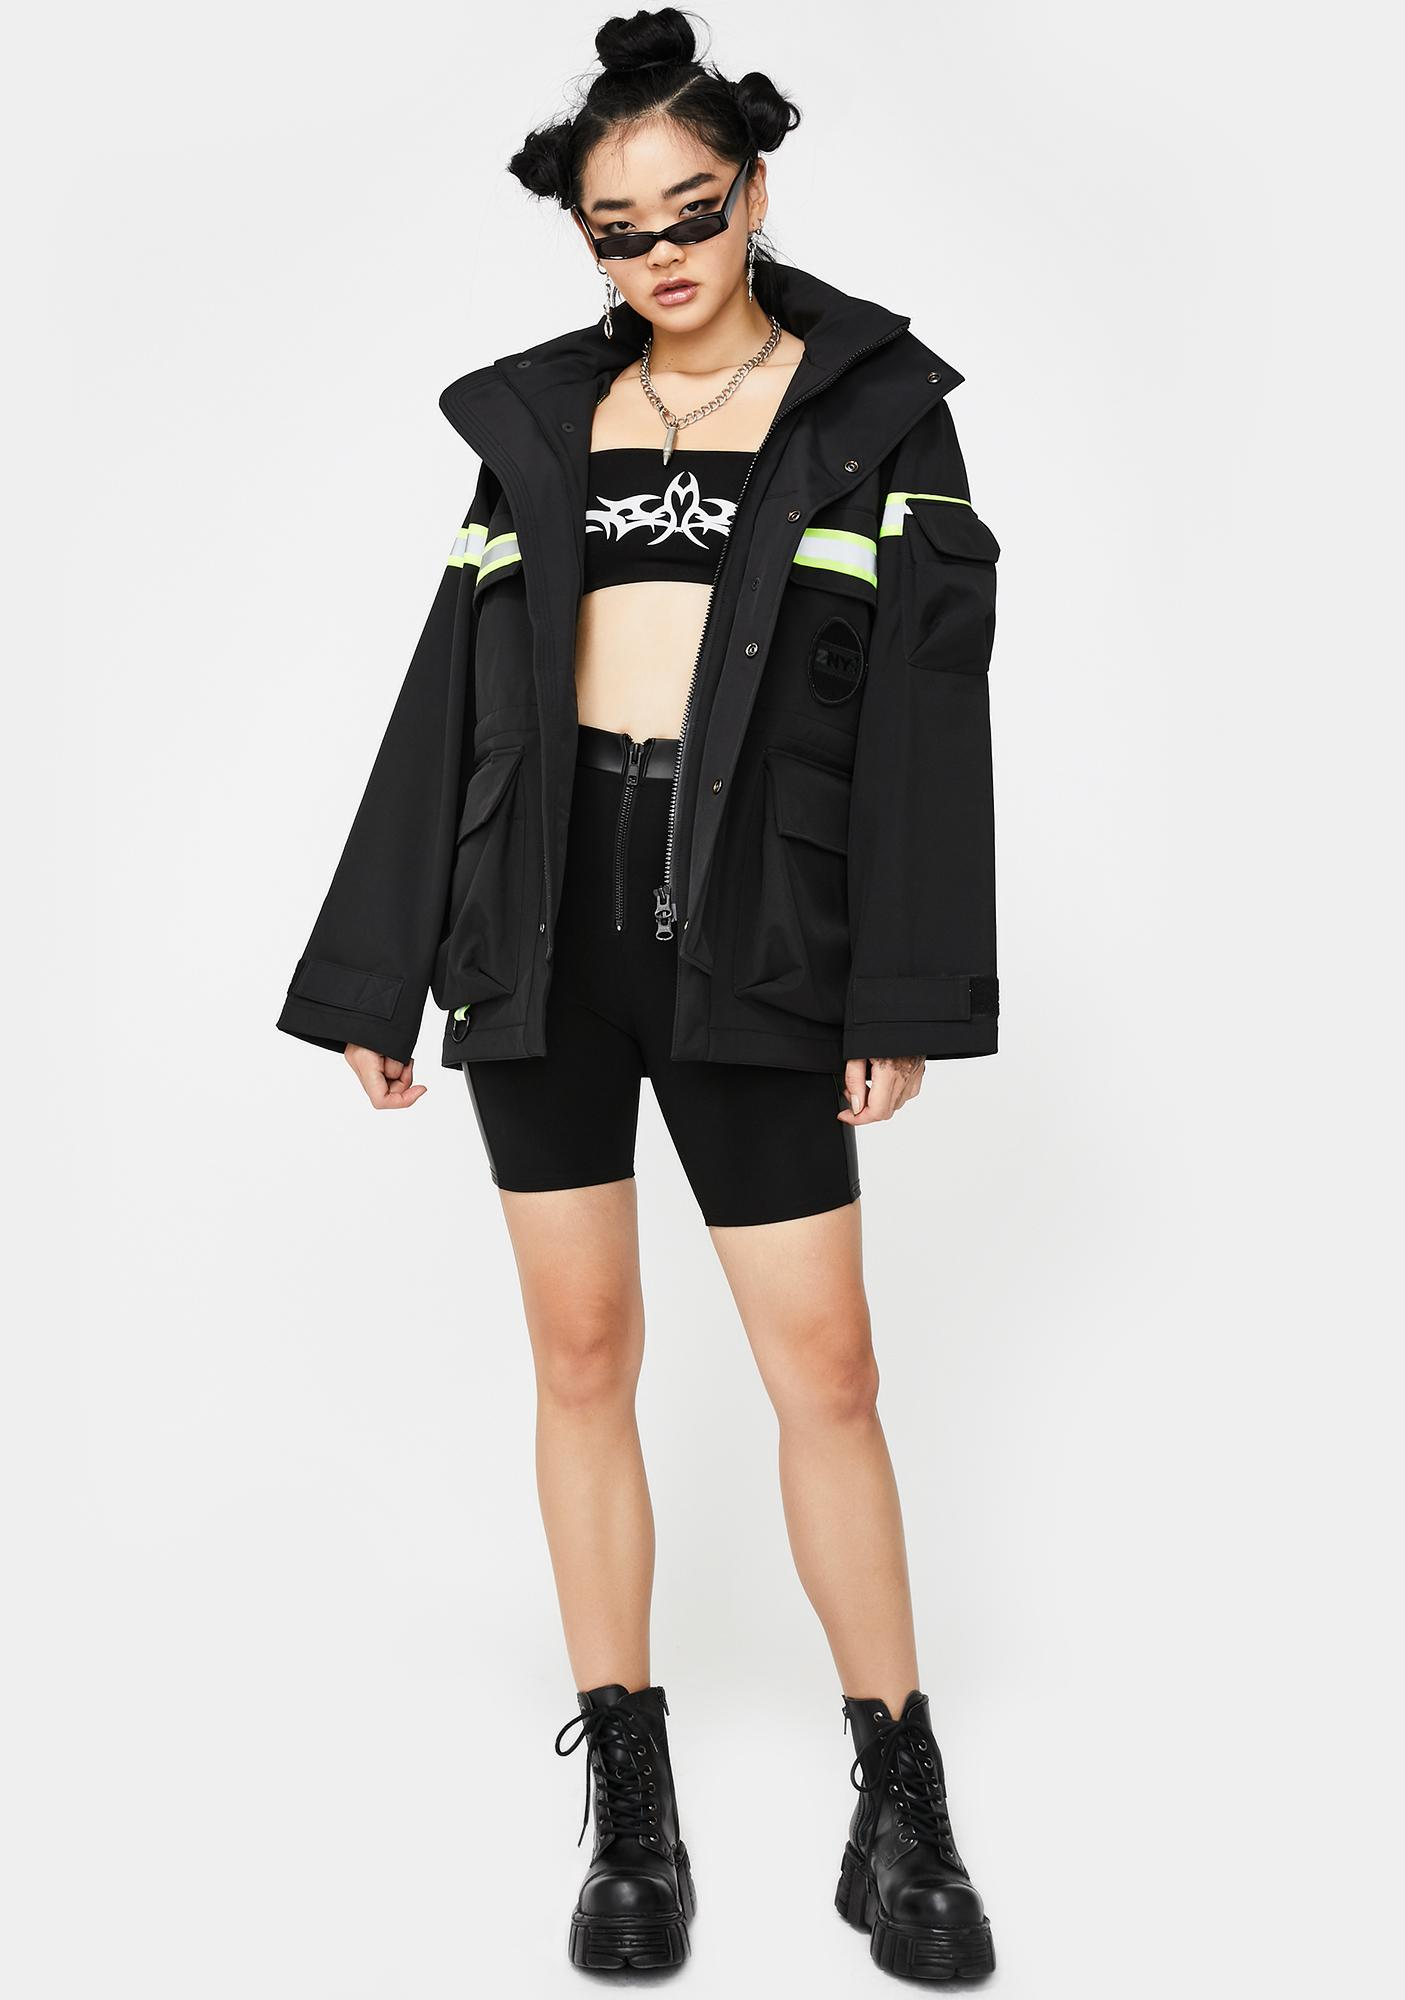 Ziq & Yoni Lifesaver Reflective Jacket